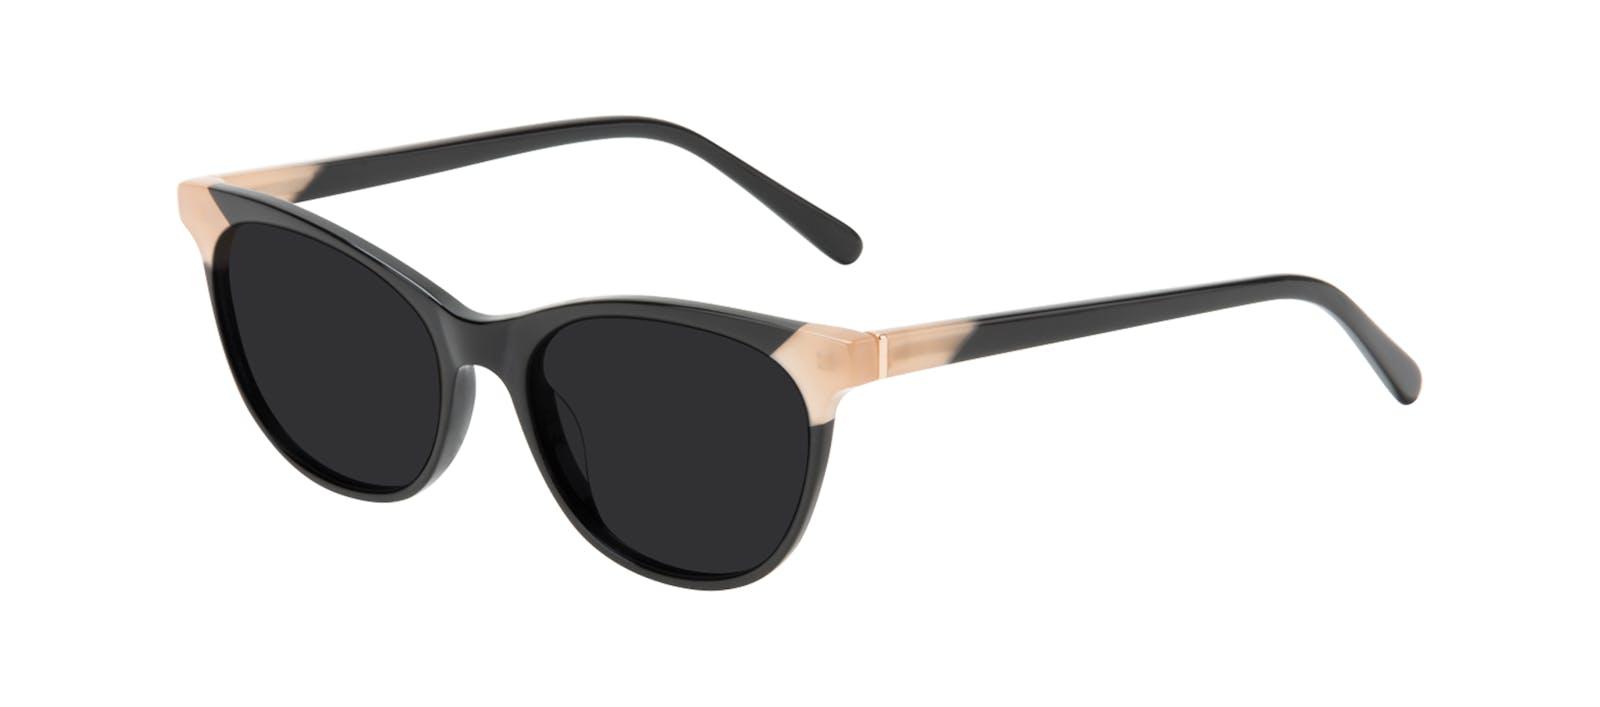 b74b545f2a Affordable Fashion Glasses Cat Eye Sunglasses Women Witty Black Ivory Tilt